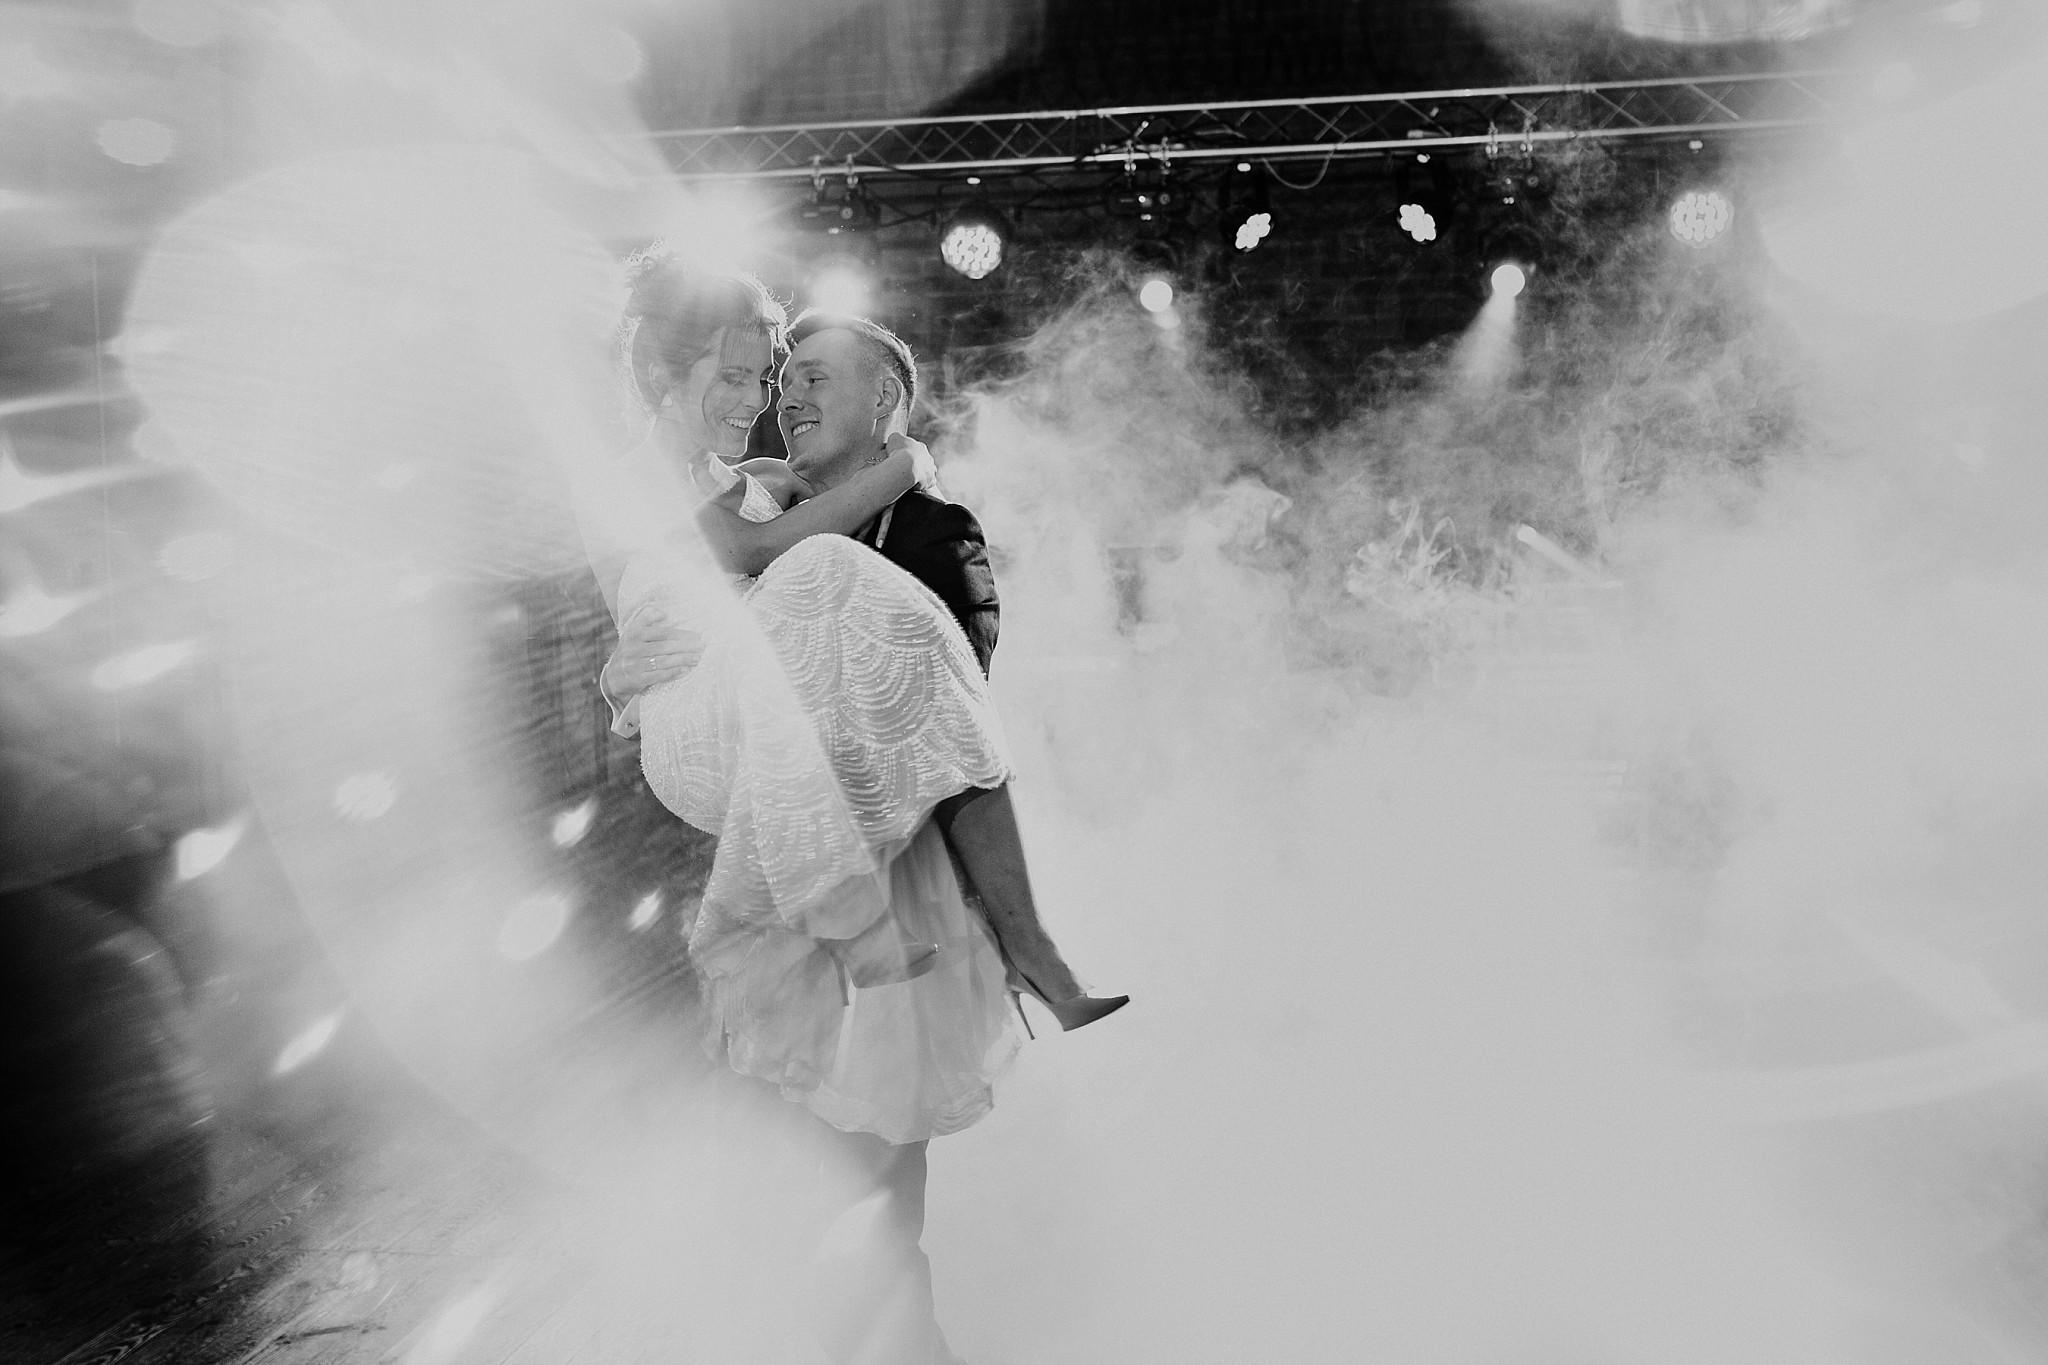 fotograf poznan wesele dobra truskawka piekne wesele pod poznaniem wesele w dobrej truskawce piekna para mloda slub marzen slub koronawirus slub listopad wesele koronawirus 322